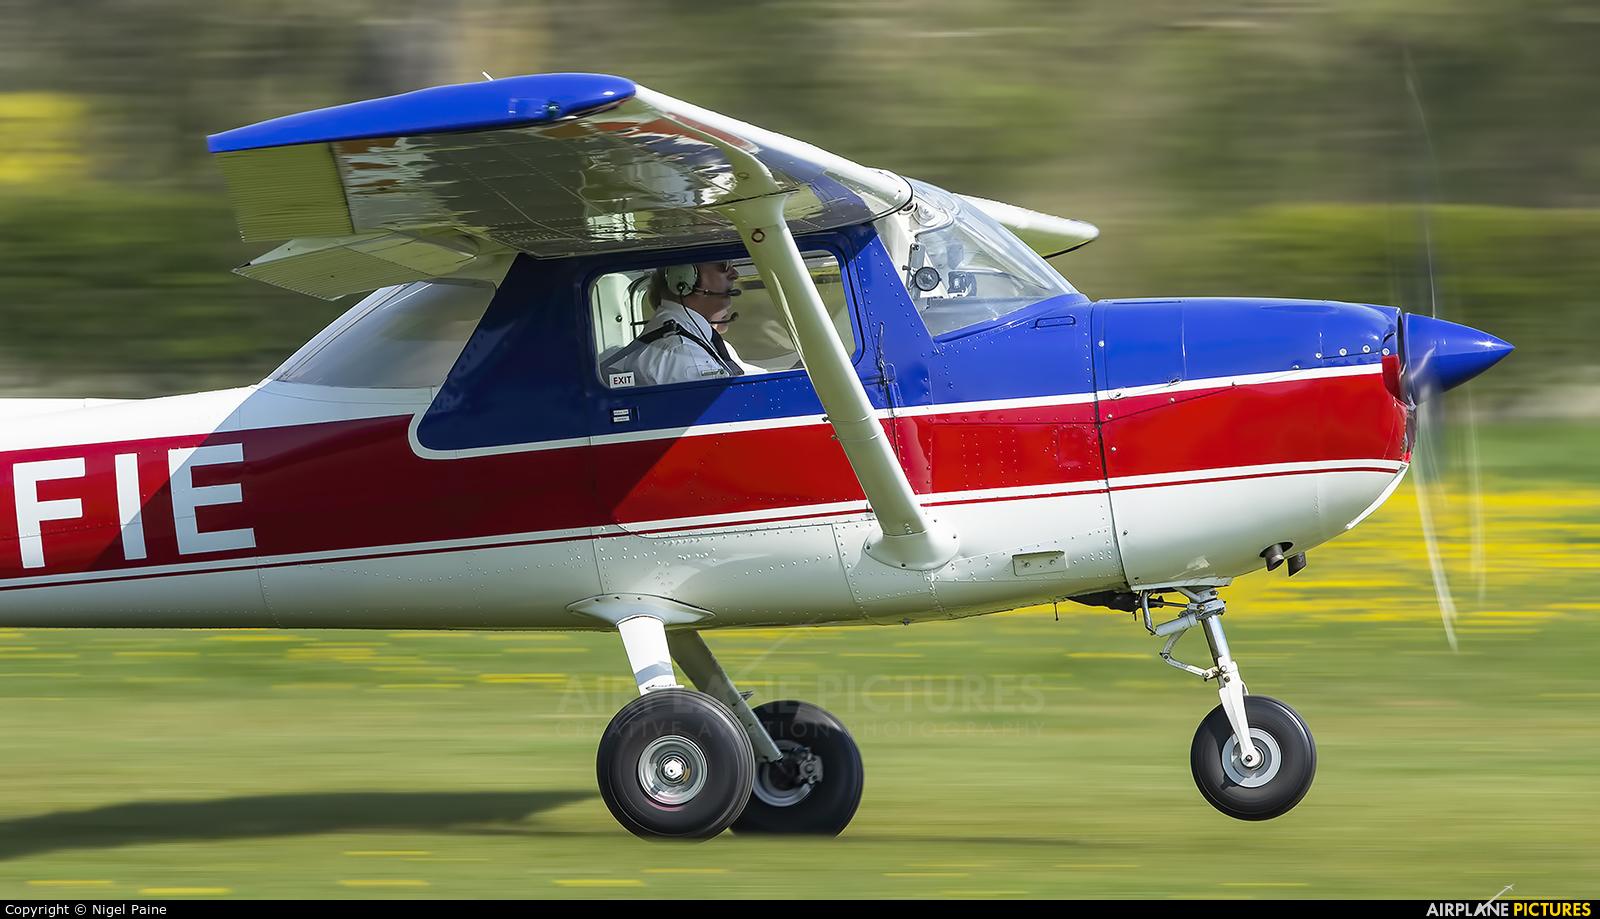 Private G-BFIE aircraft at Lashenden / Headcorn